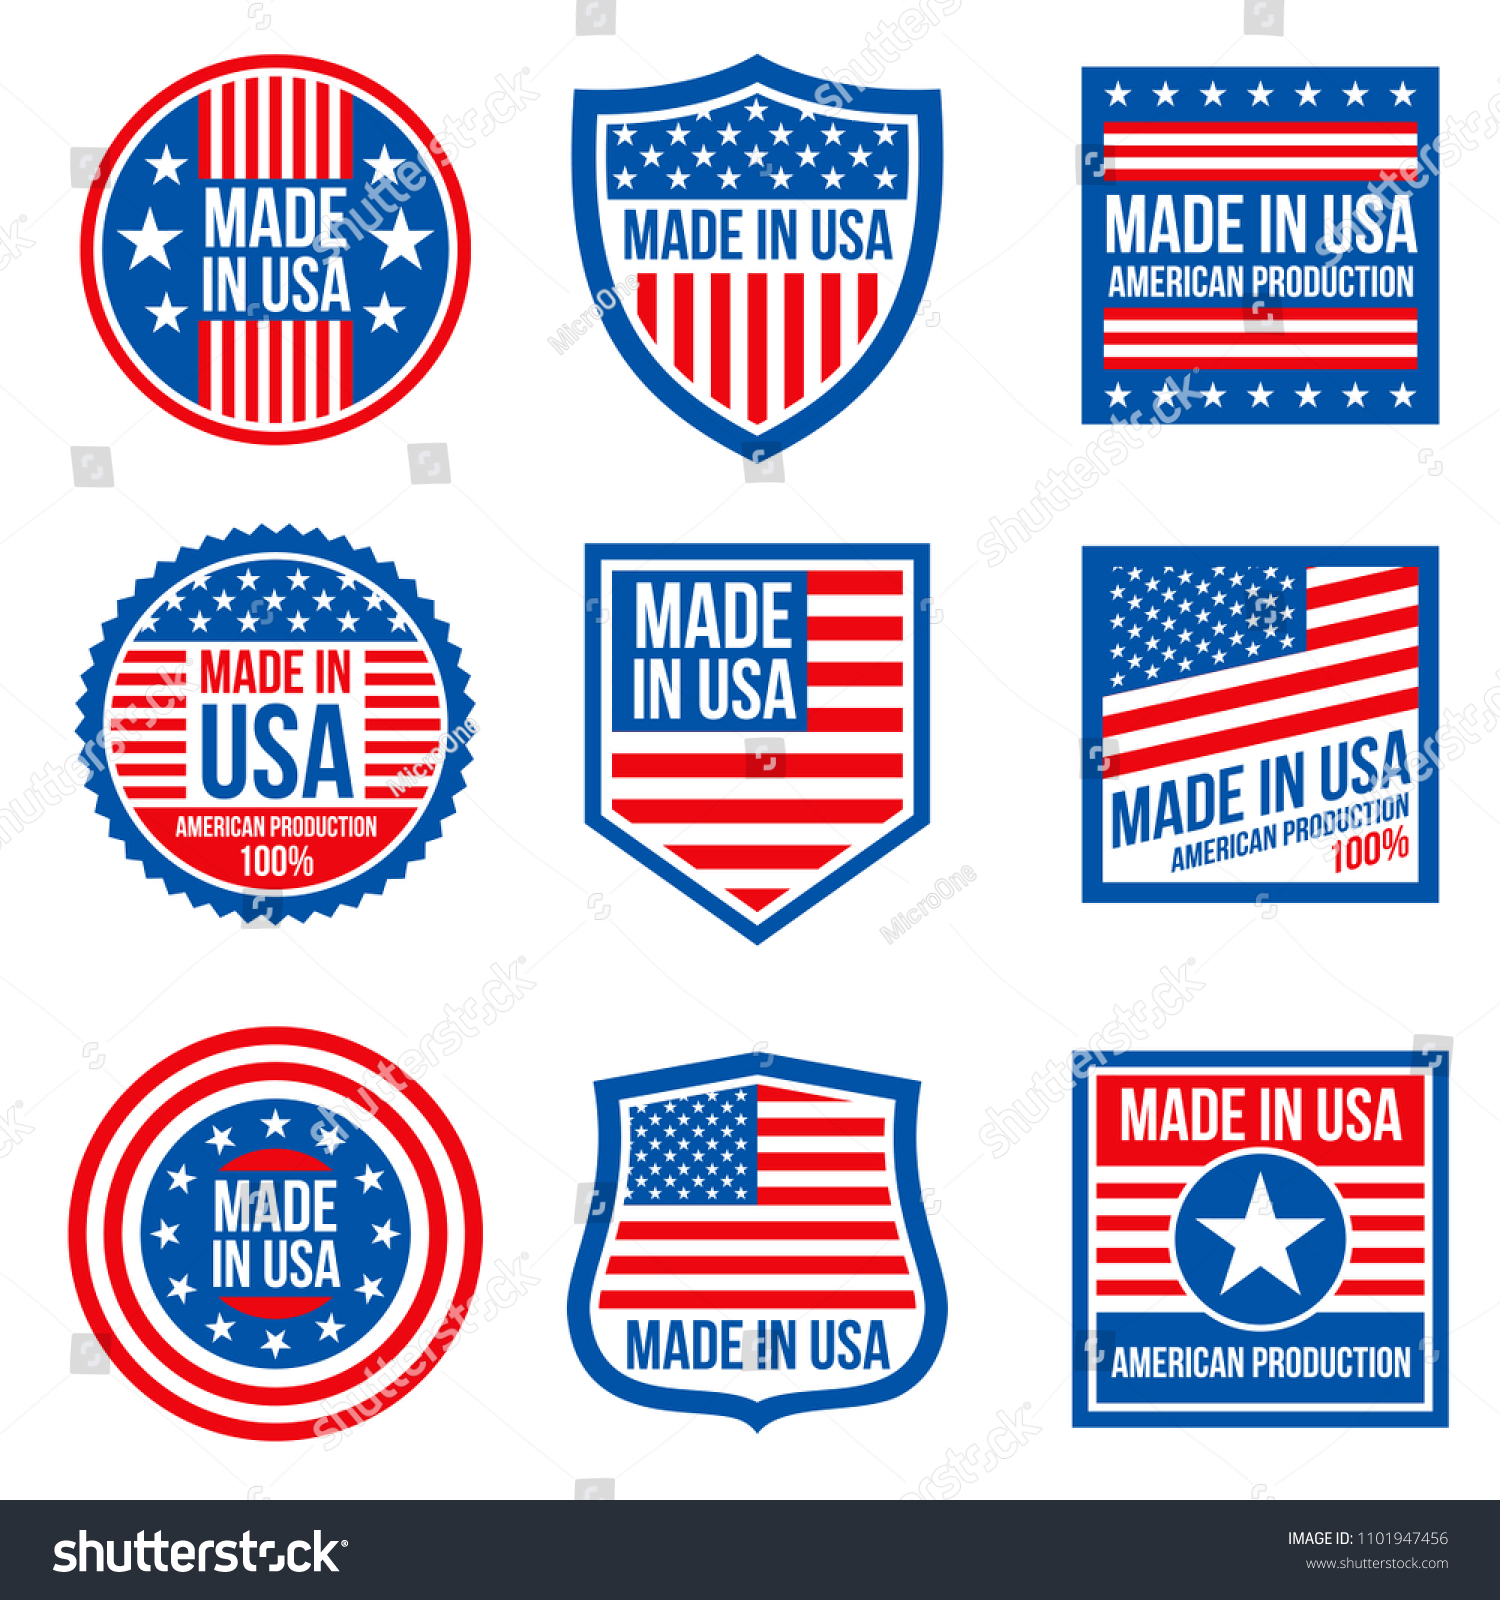 Vintage Made Usa Badges American Patriotic Stock Illustration